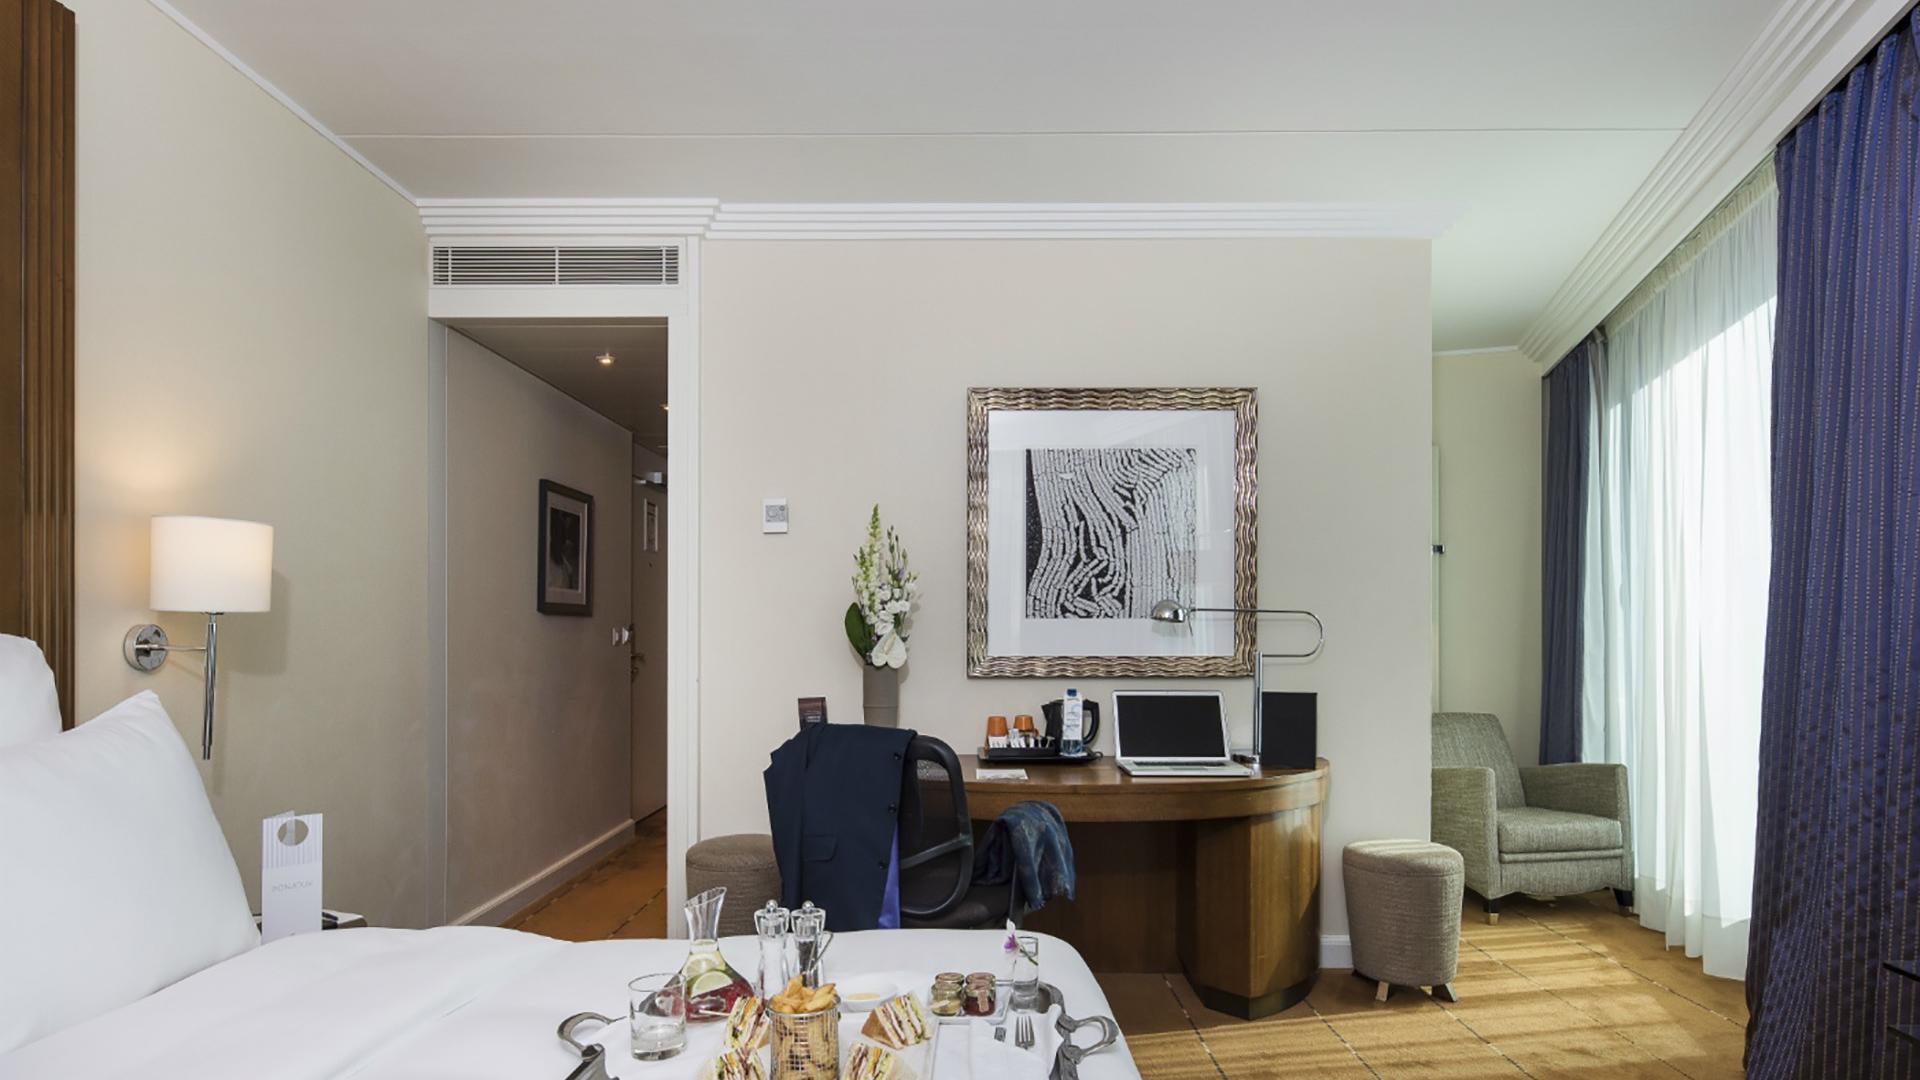 Superior Room with Room Service at Warwick Geneva